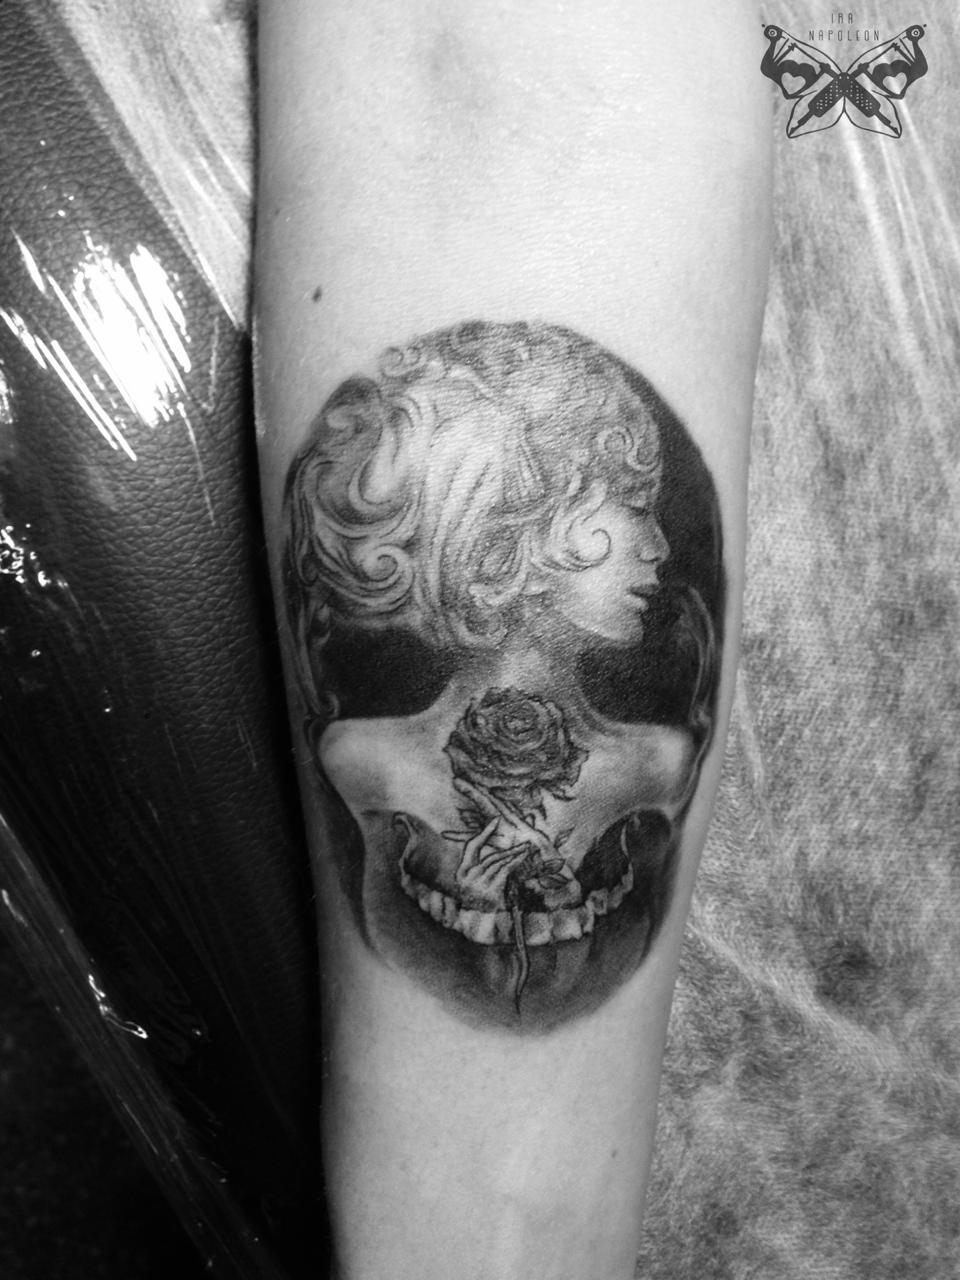 Ira Tattoos